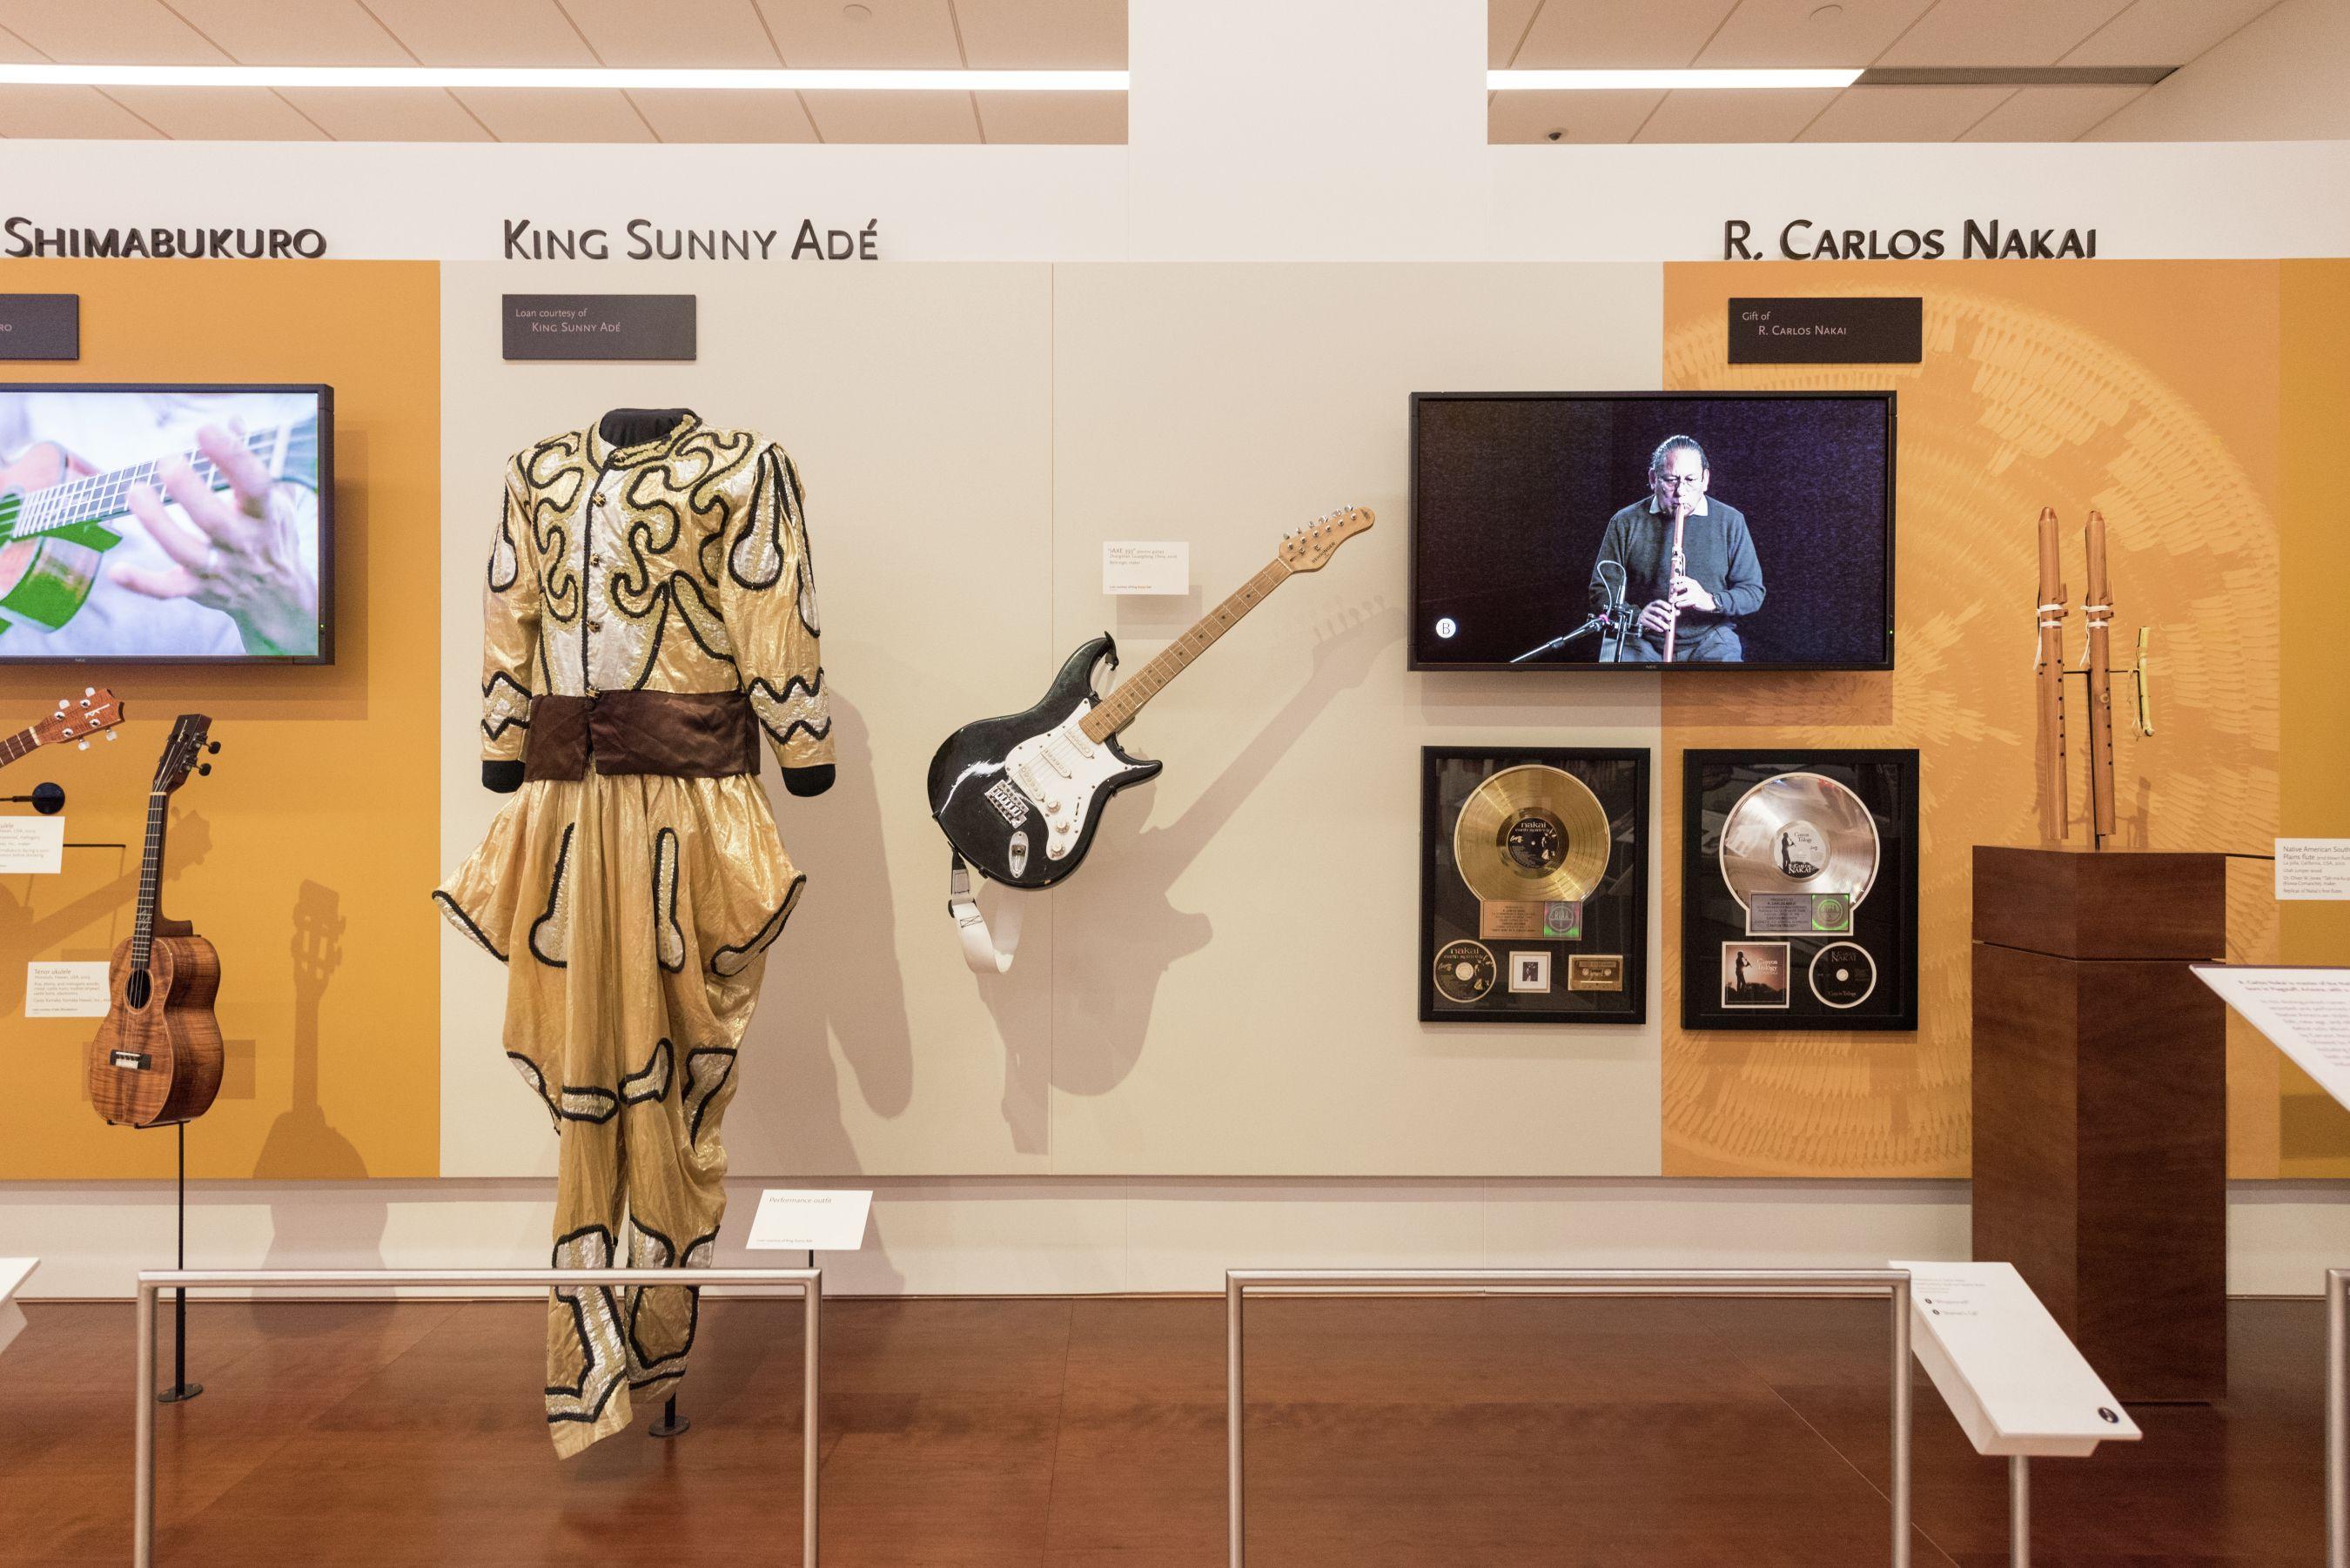 King Sunny Adé exhibit, Artist Gallery Artist gallery